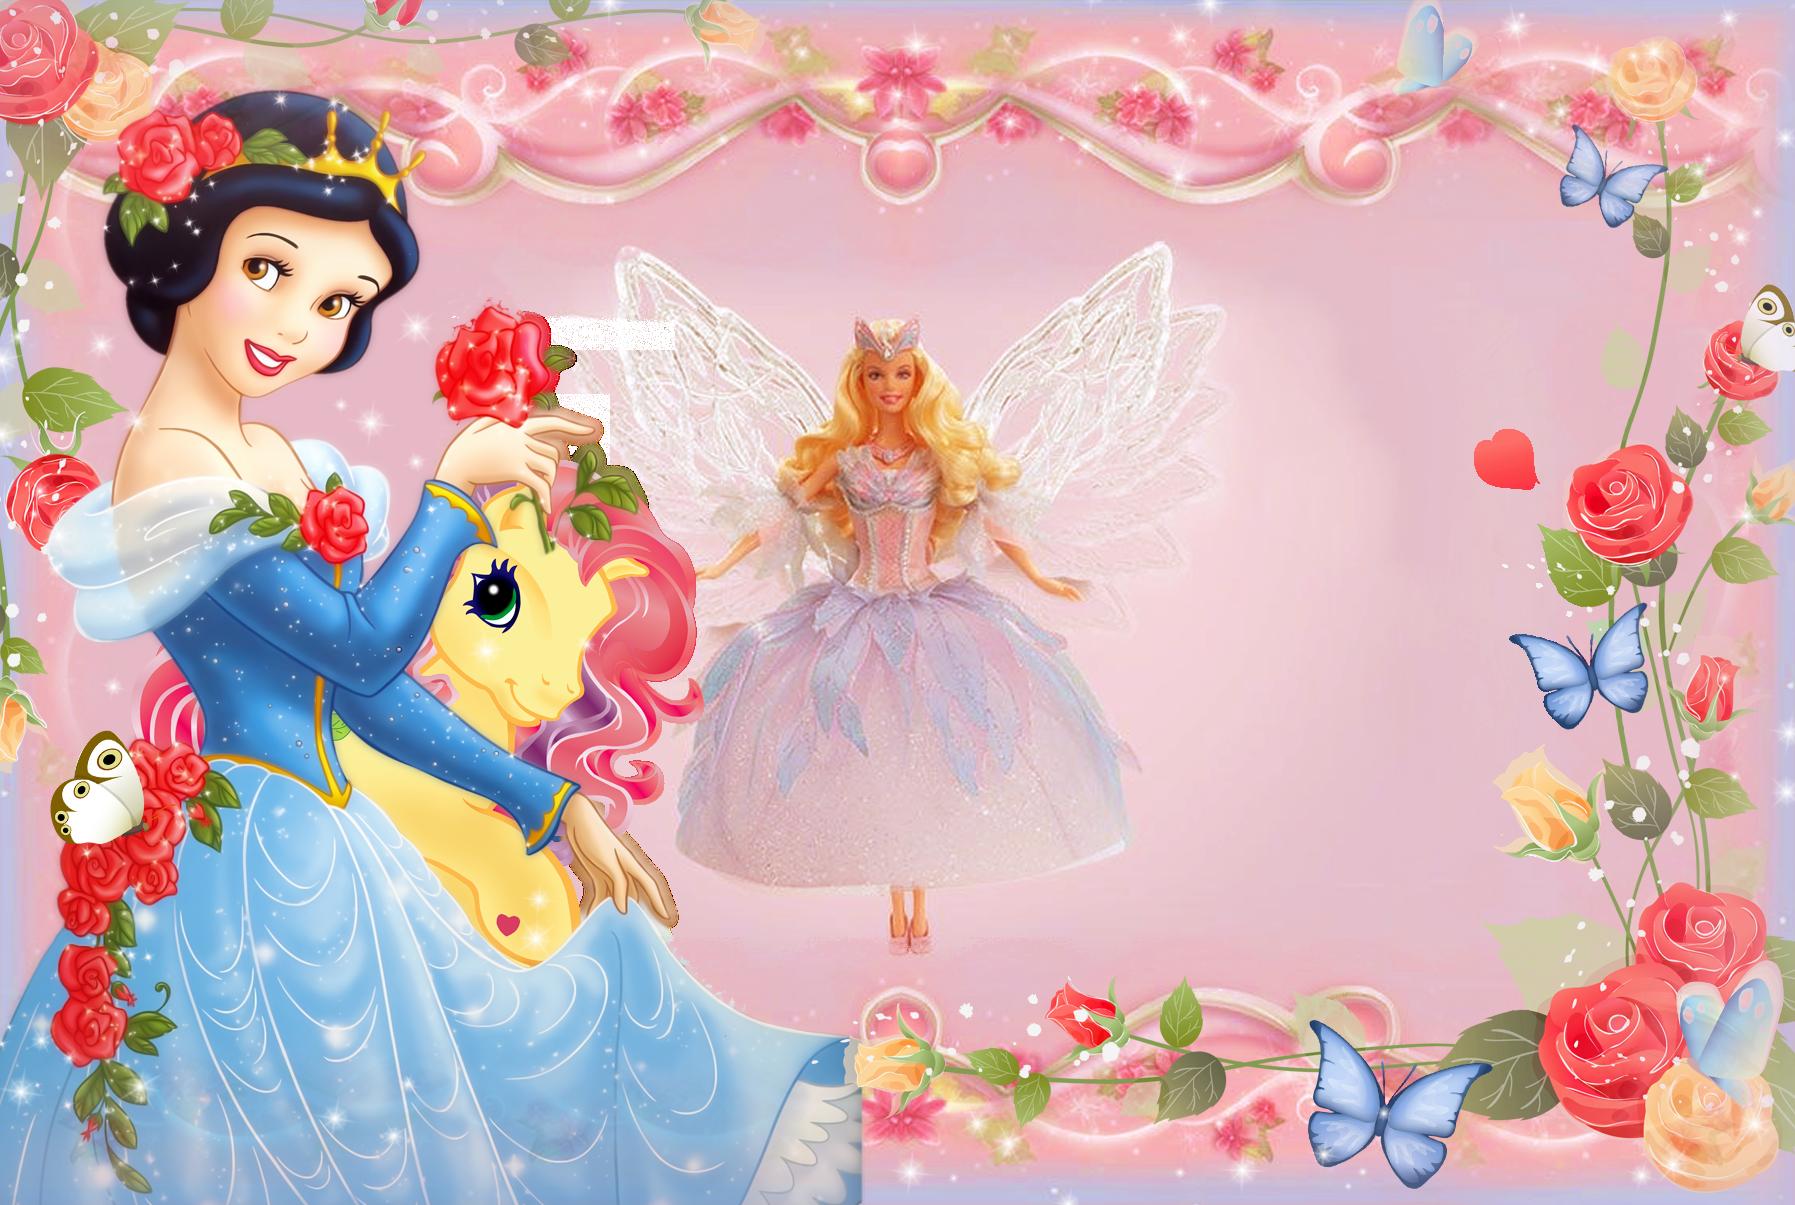 Girls transparent frame with. Clipart frames princess